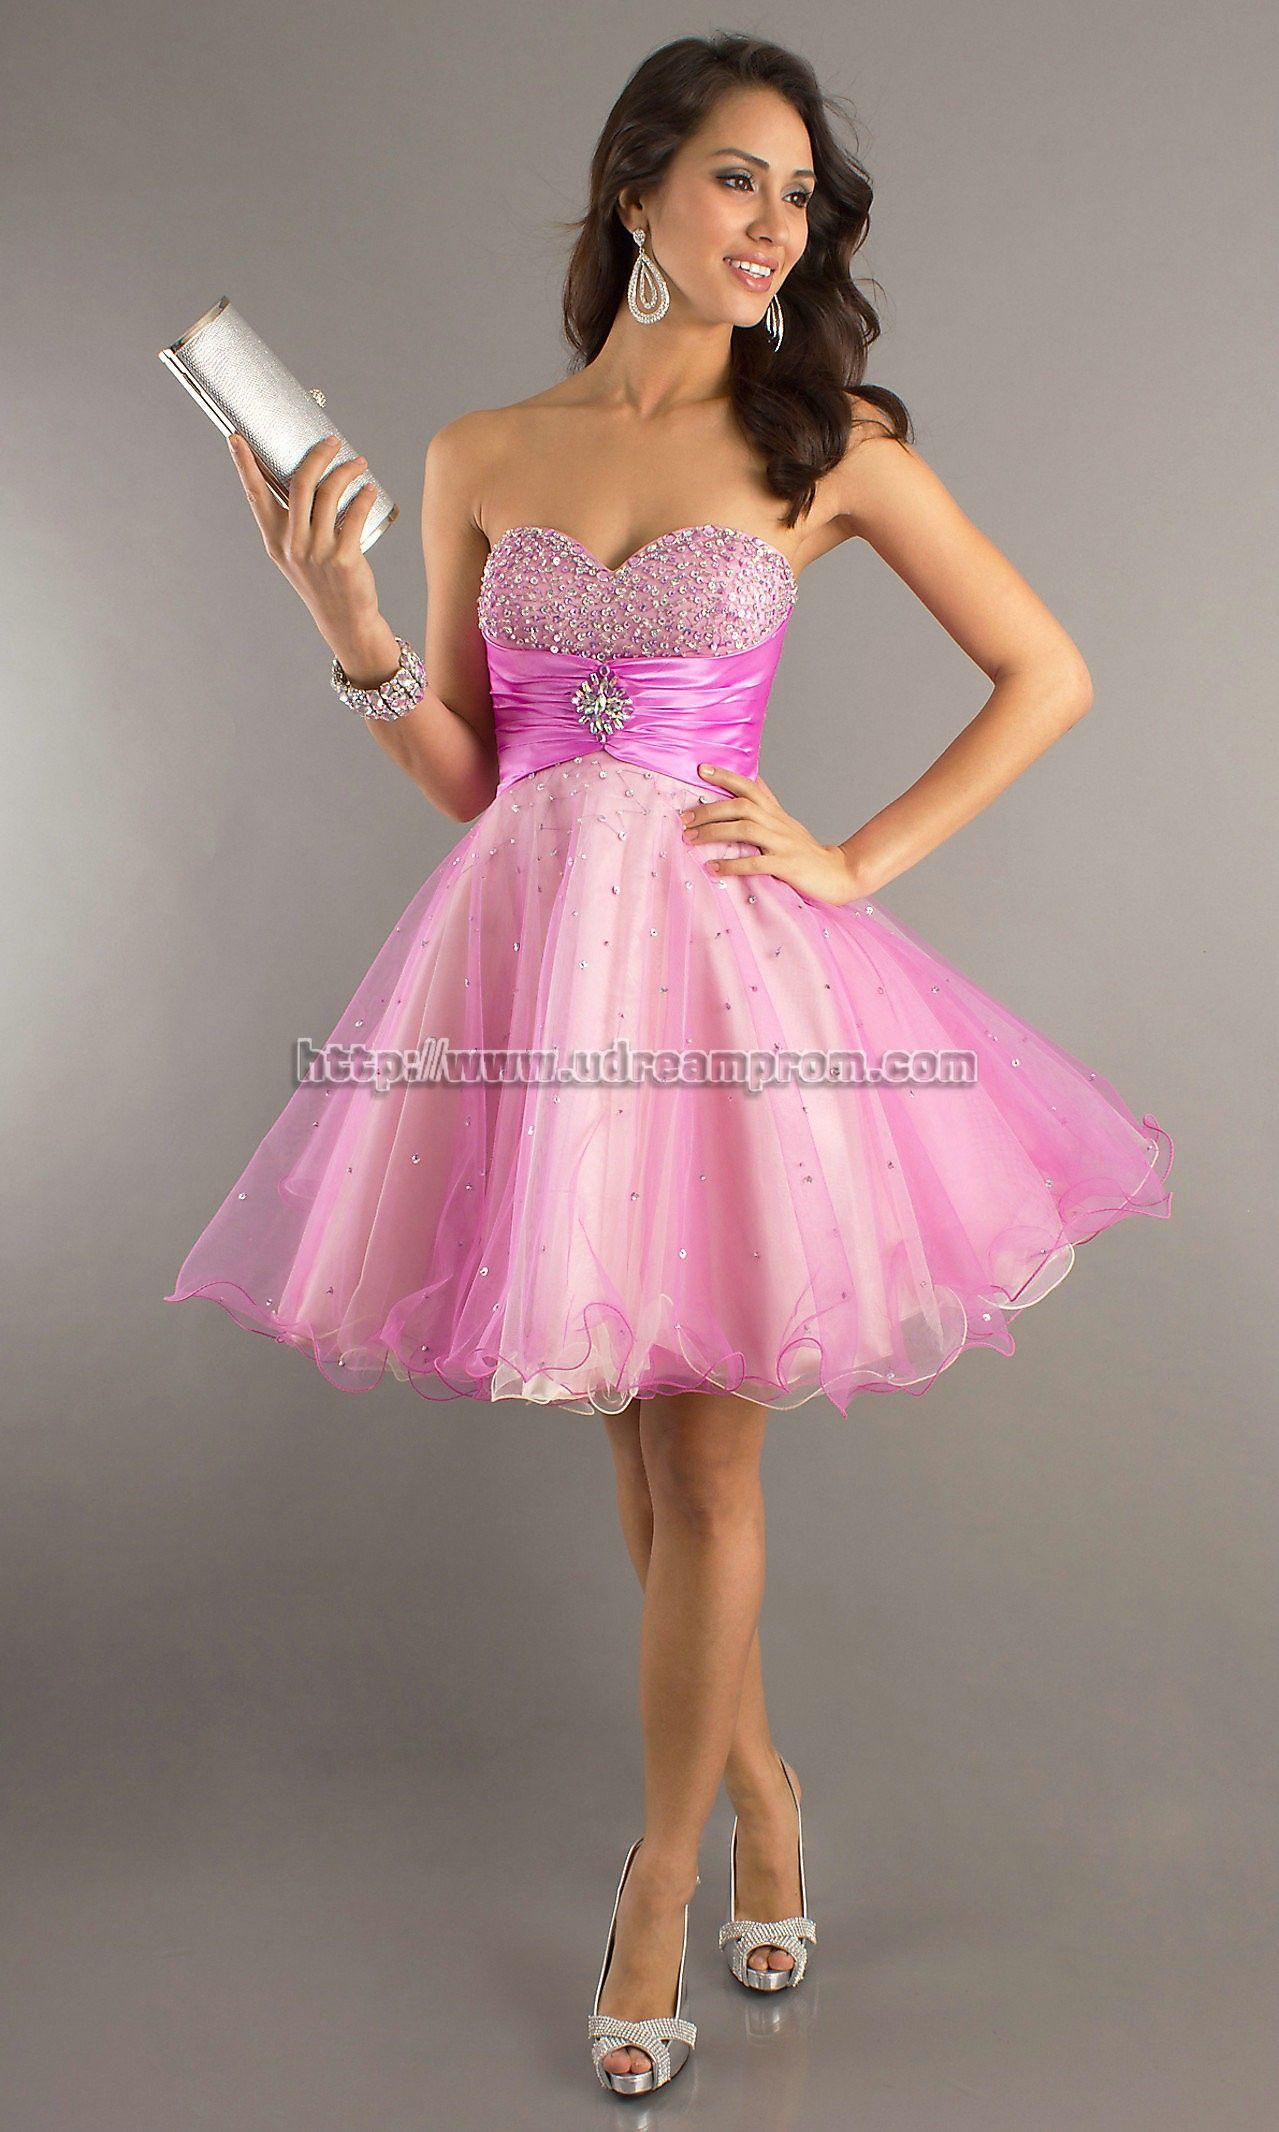 Homecoming Dresses Homecoming Dresses Homecoming Dresses | Beautiful ...